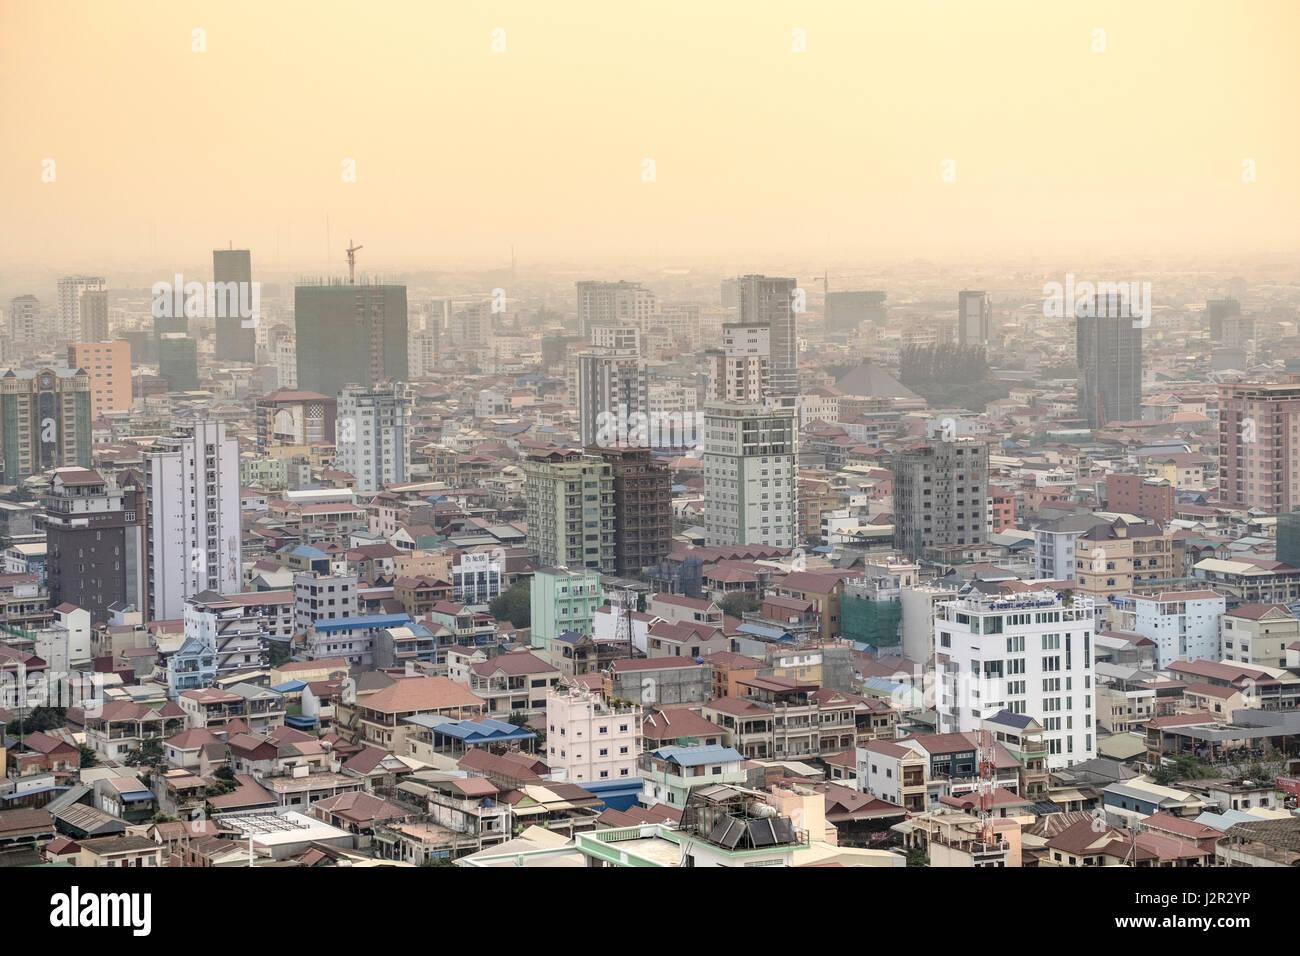 Phnom Penh Stadtzentrum und Skyline - Kambodscha Hauptstadt Stockbild